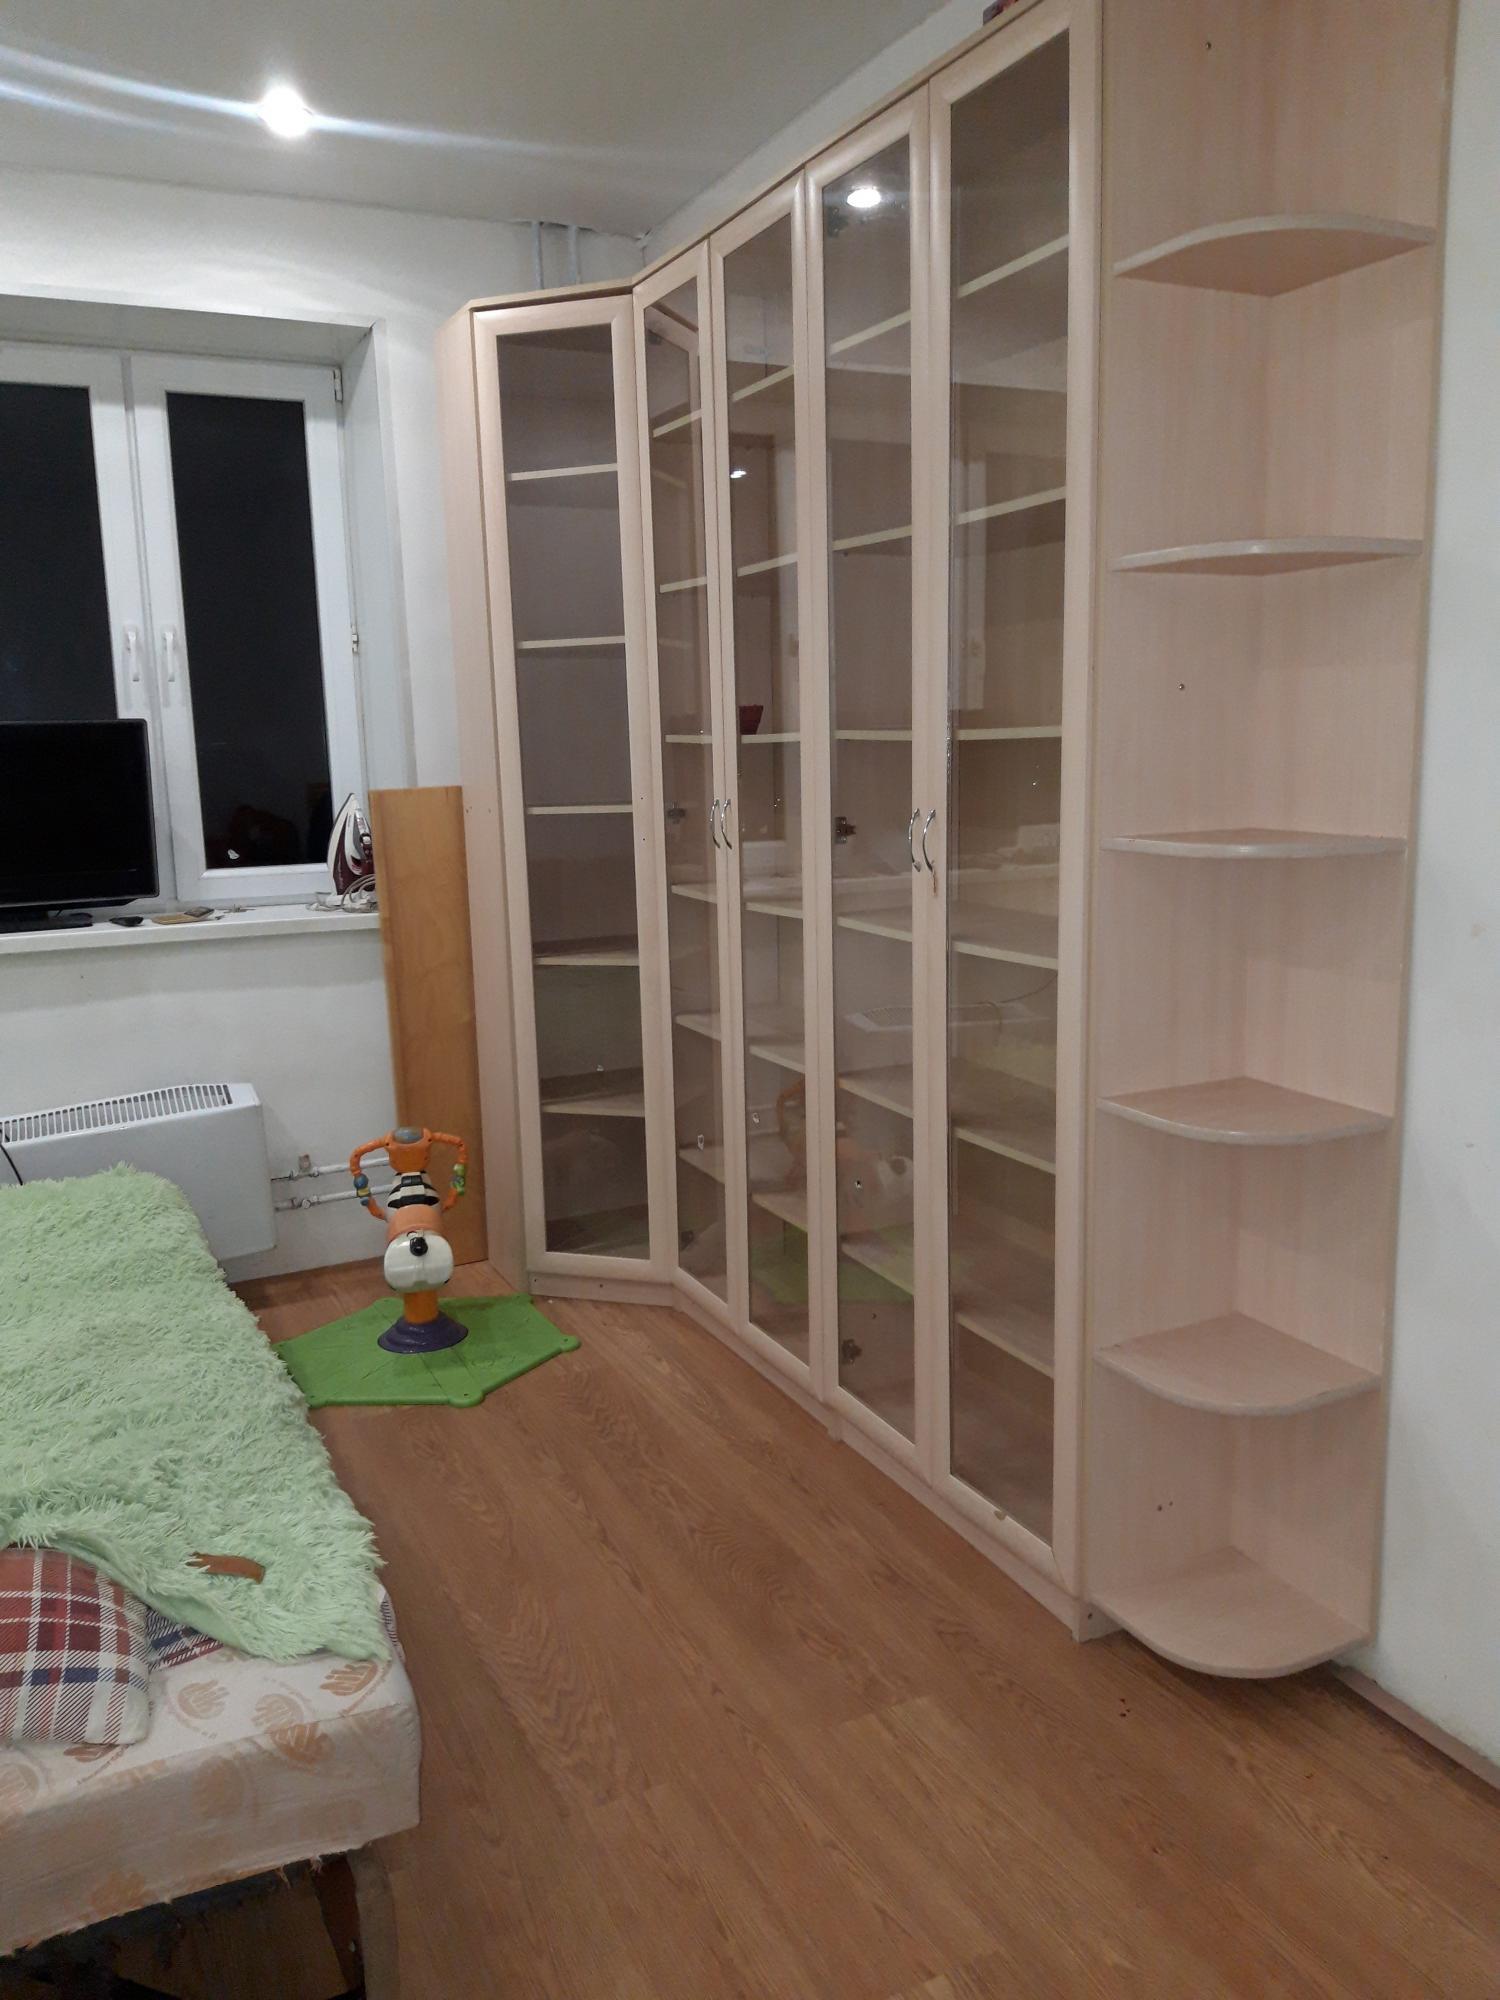 Квартира, 1 комната, 34 м² 89190284316 купить 1